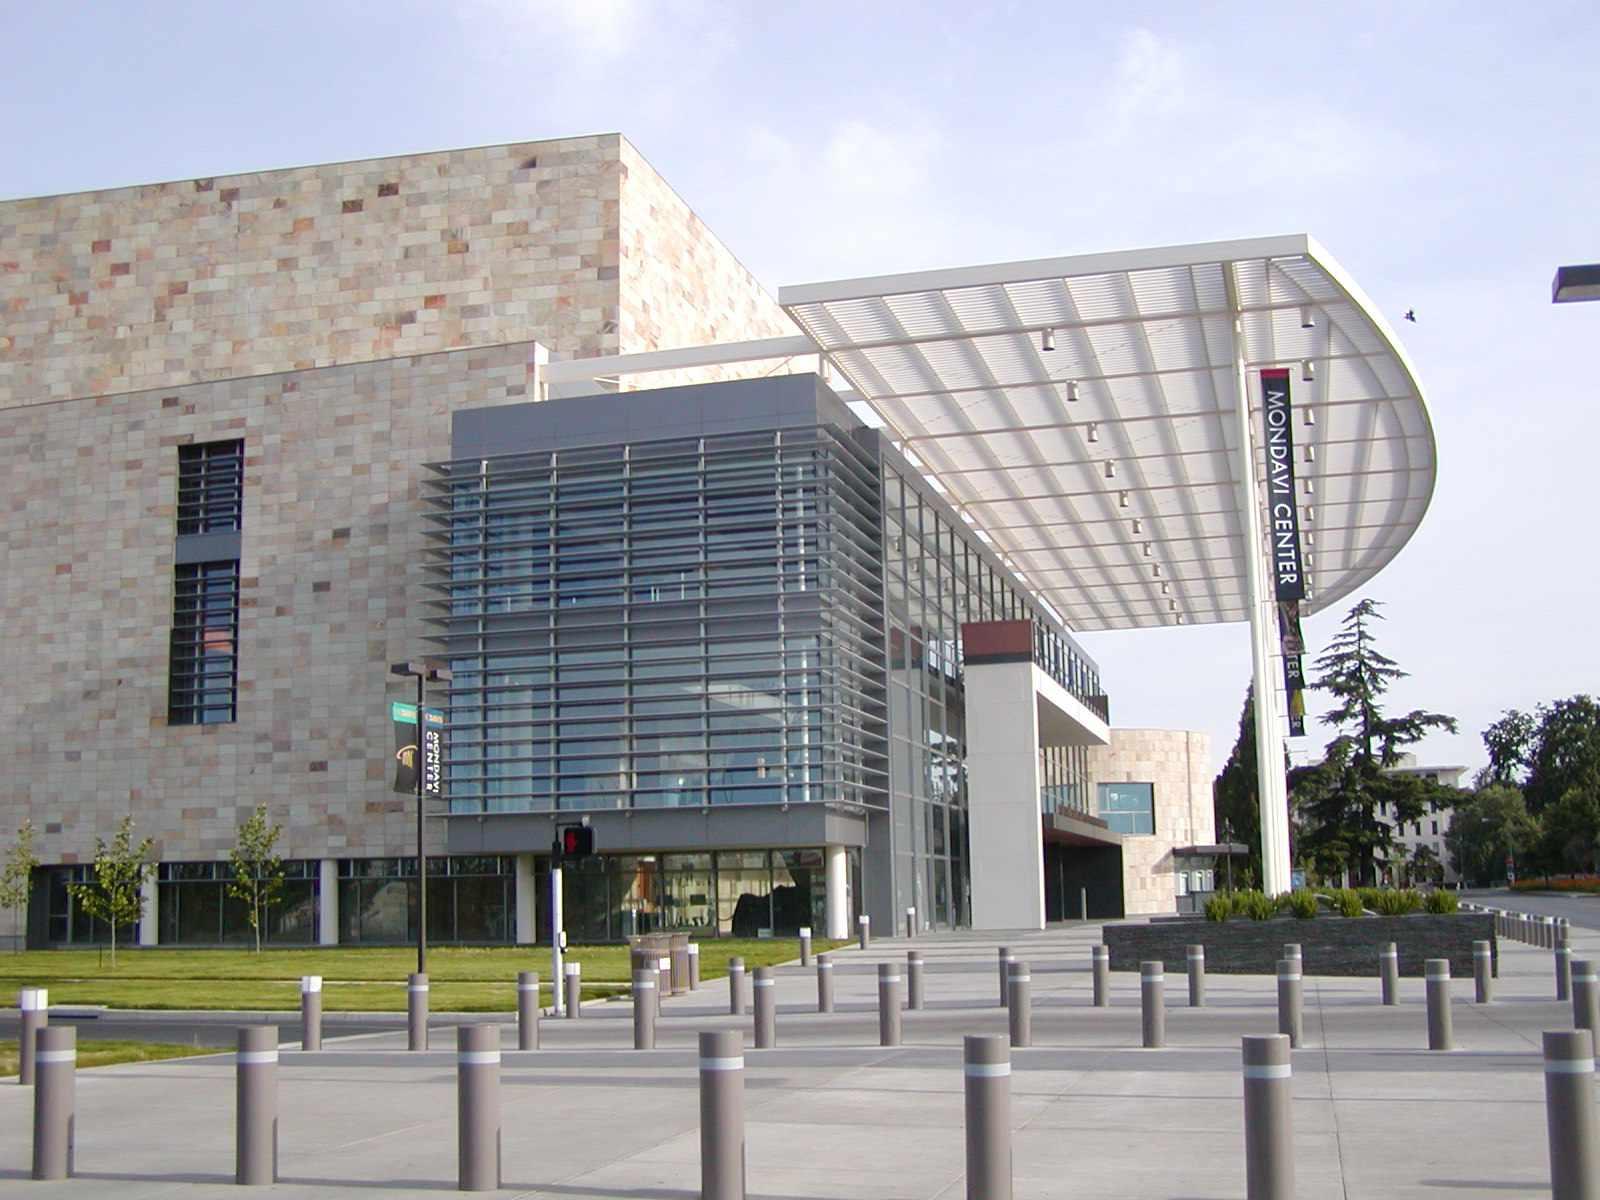 Mondavi Center at UC Davis on a sunny day.